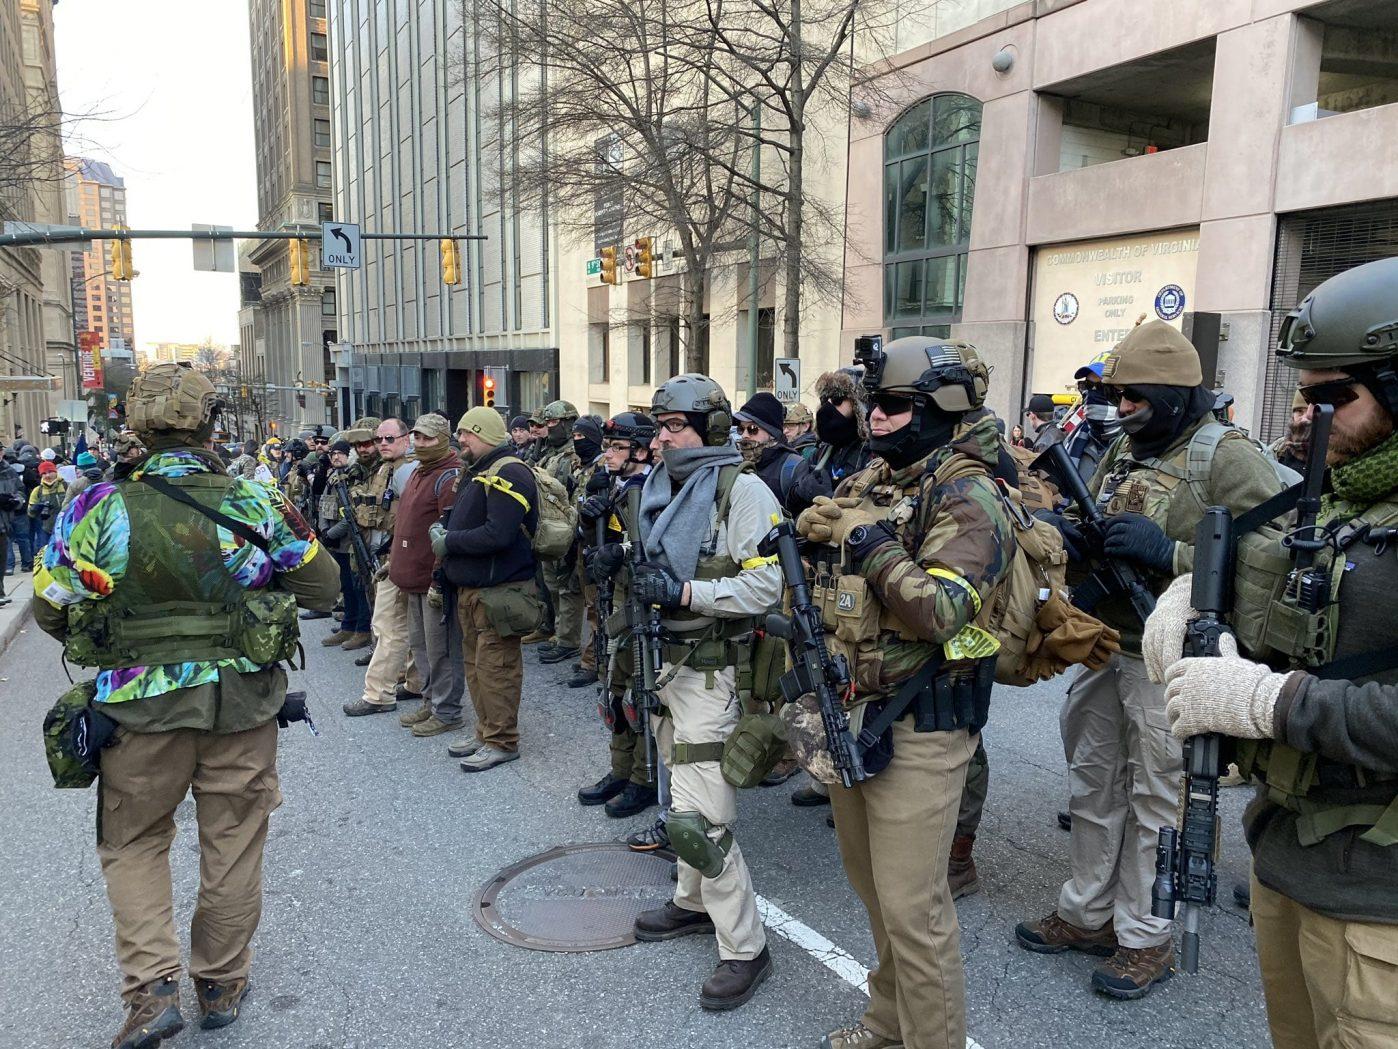 gun rally actually more peaceful than media , hollywood say